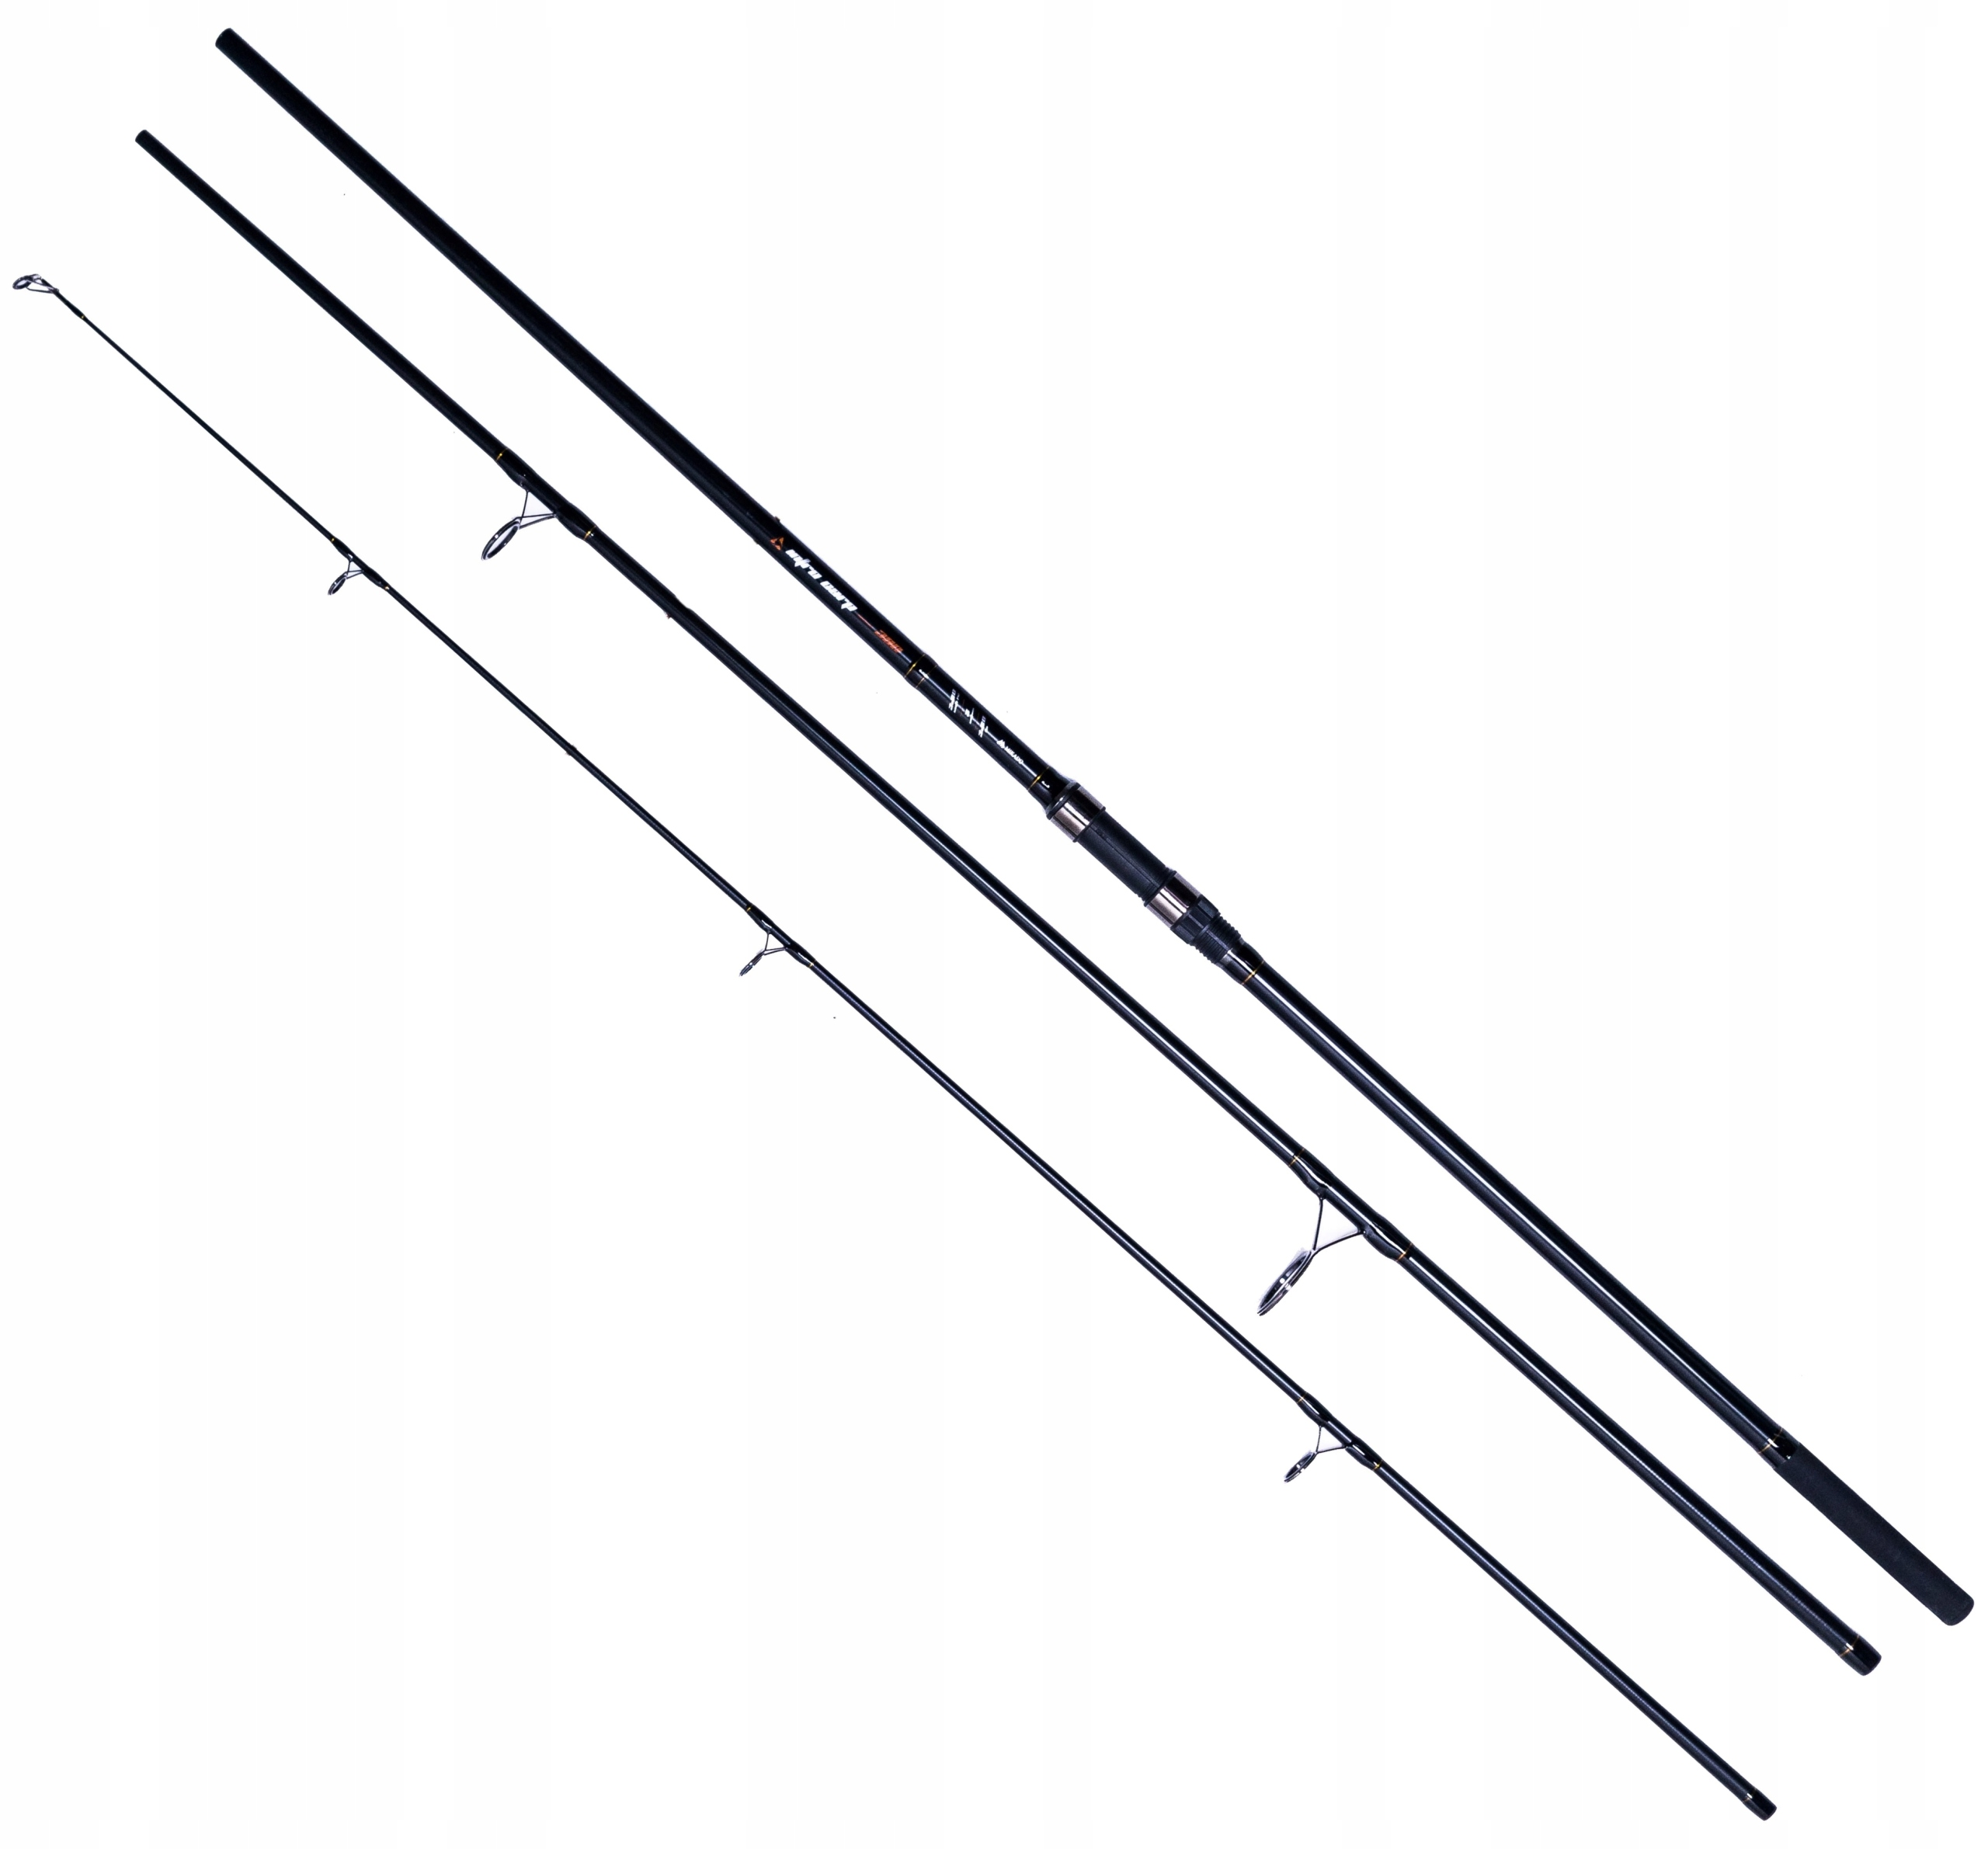 Prút Karpiowa Intro Mikado Kapor 3.9 m, 3 kg uhlíka